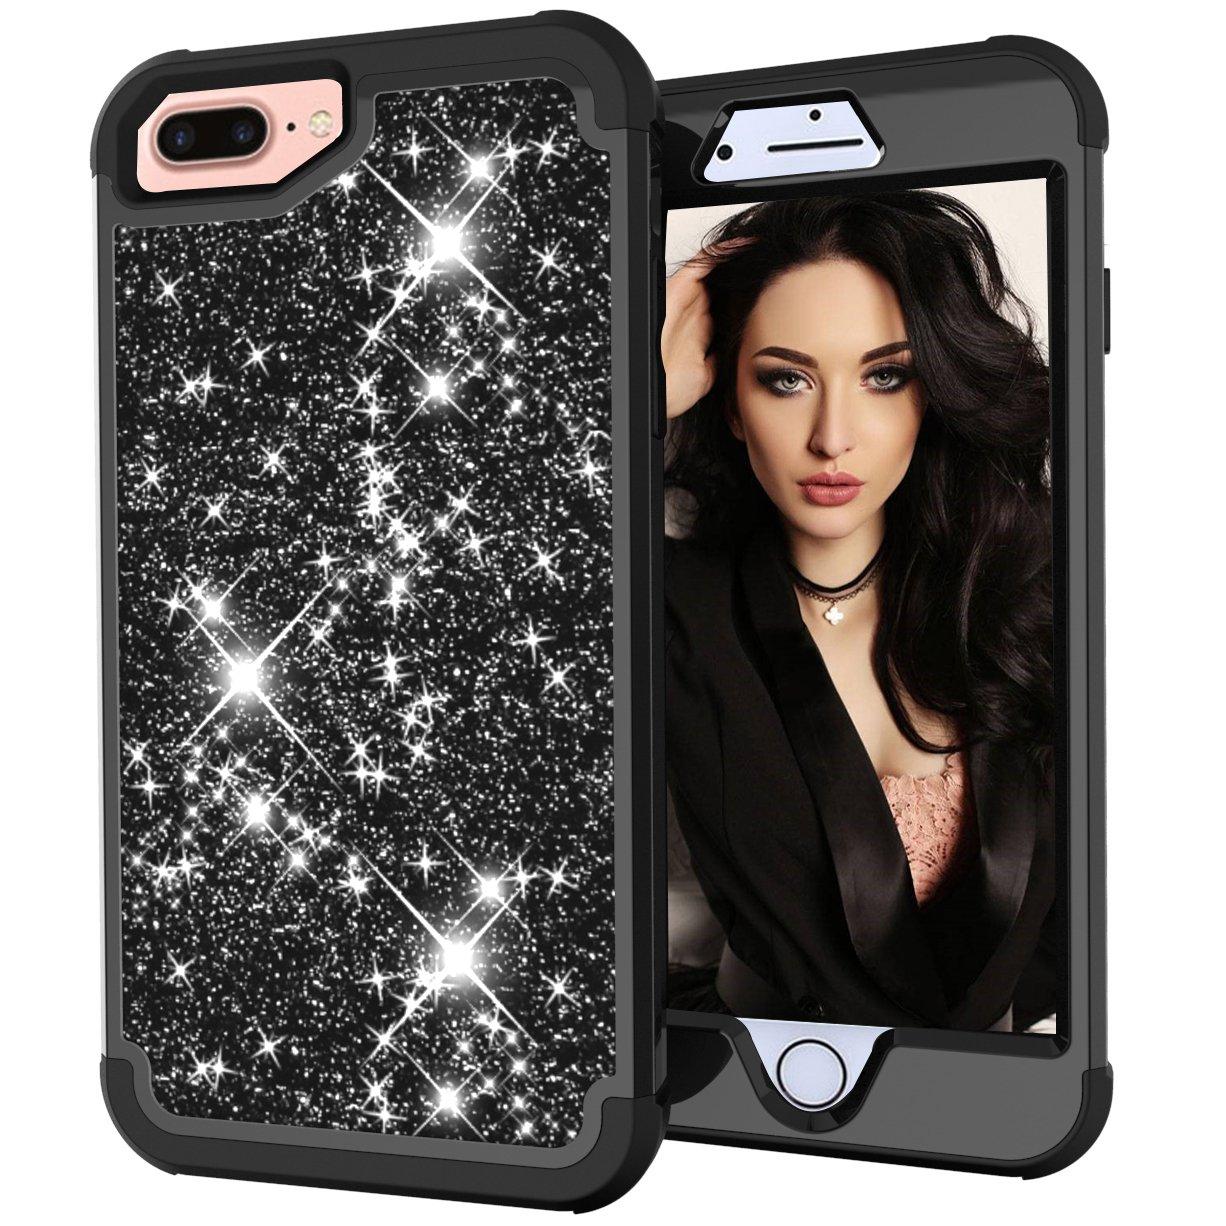 IPhone 7 Plus/8 Plus Case,Heavy Duty Slim Sparkle Bling Glitter Case 3 in 1 $5.2